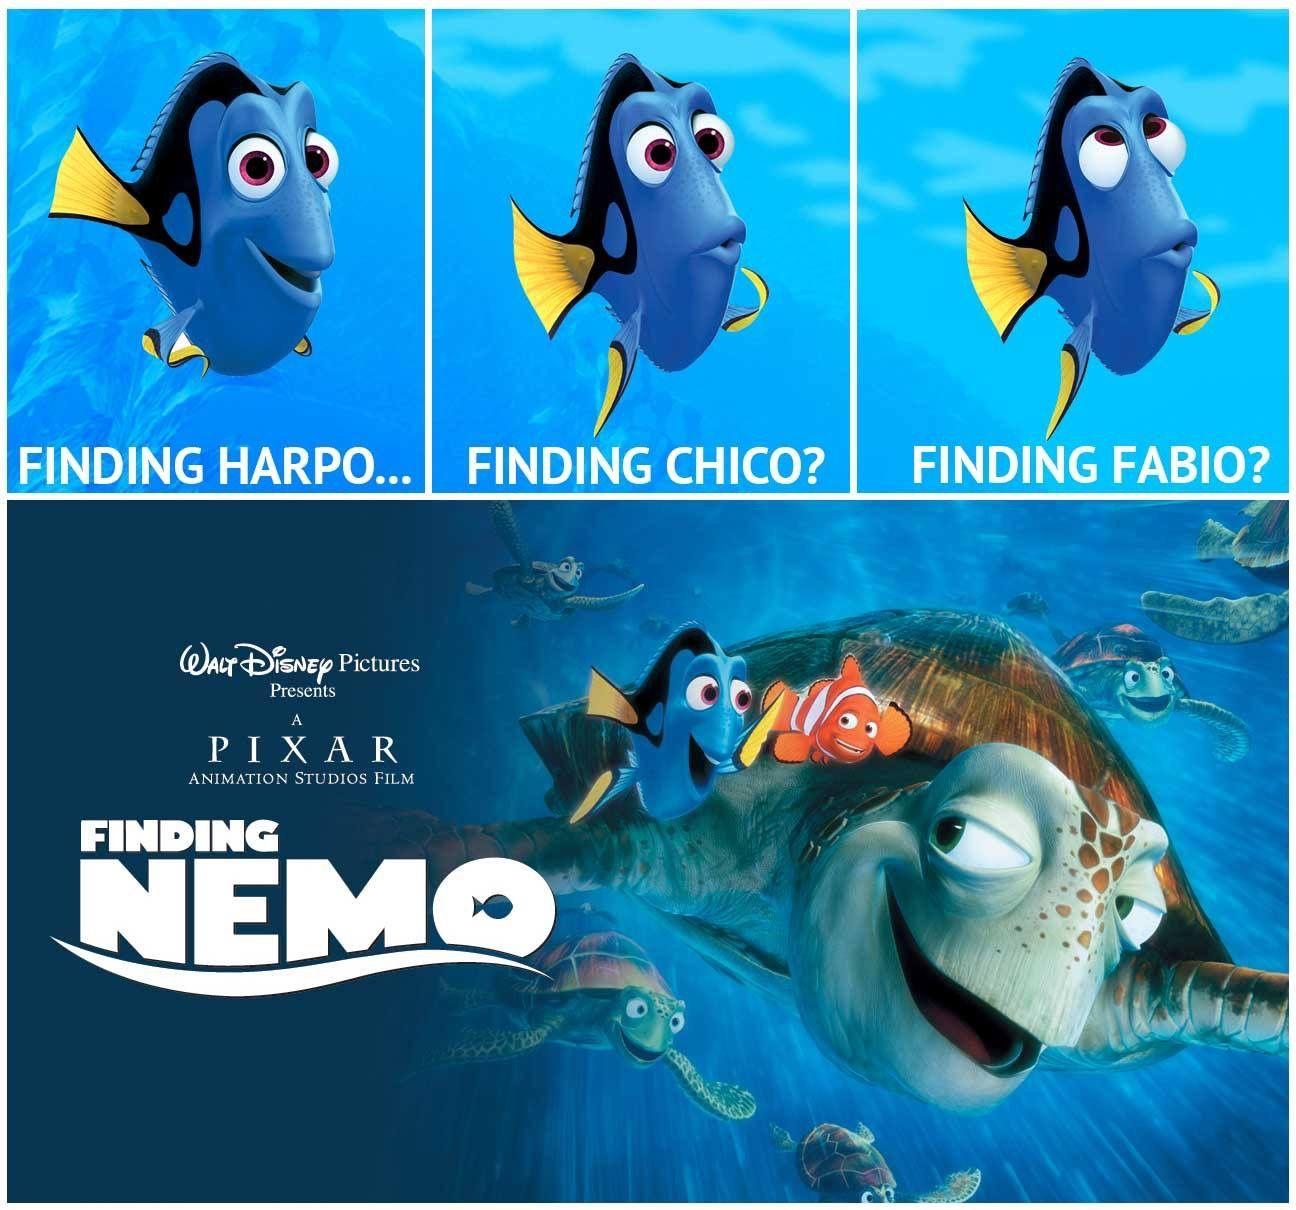 Pin by Tim Haney on Lovin' Disney | Walt disney pictures ...  Walt Disney Pictures Presents A Pixar Animation Studios Film Finding Nemo